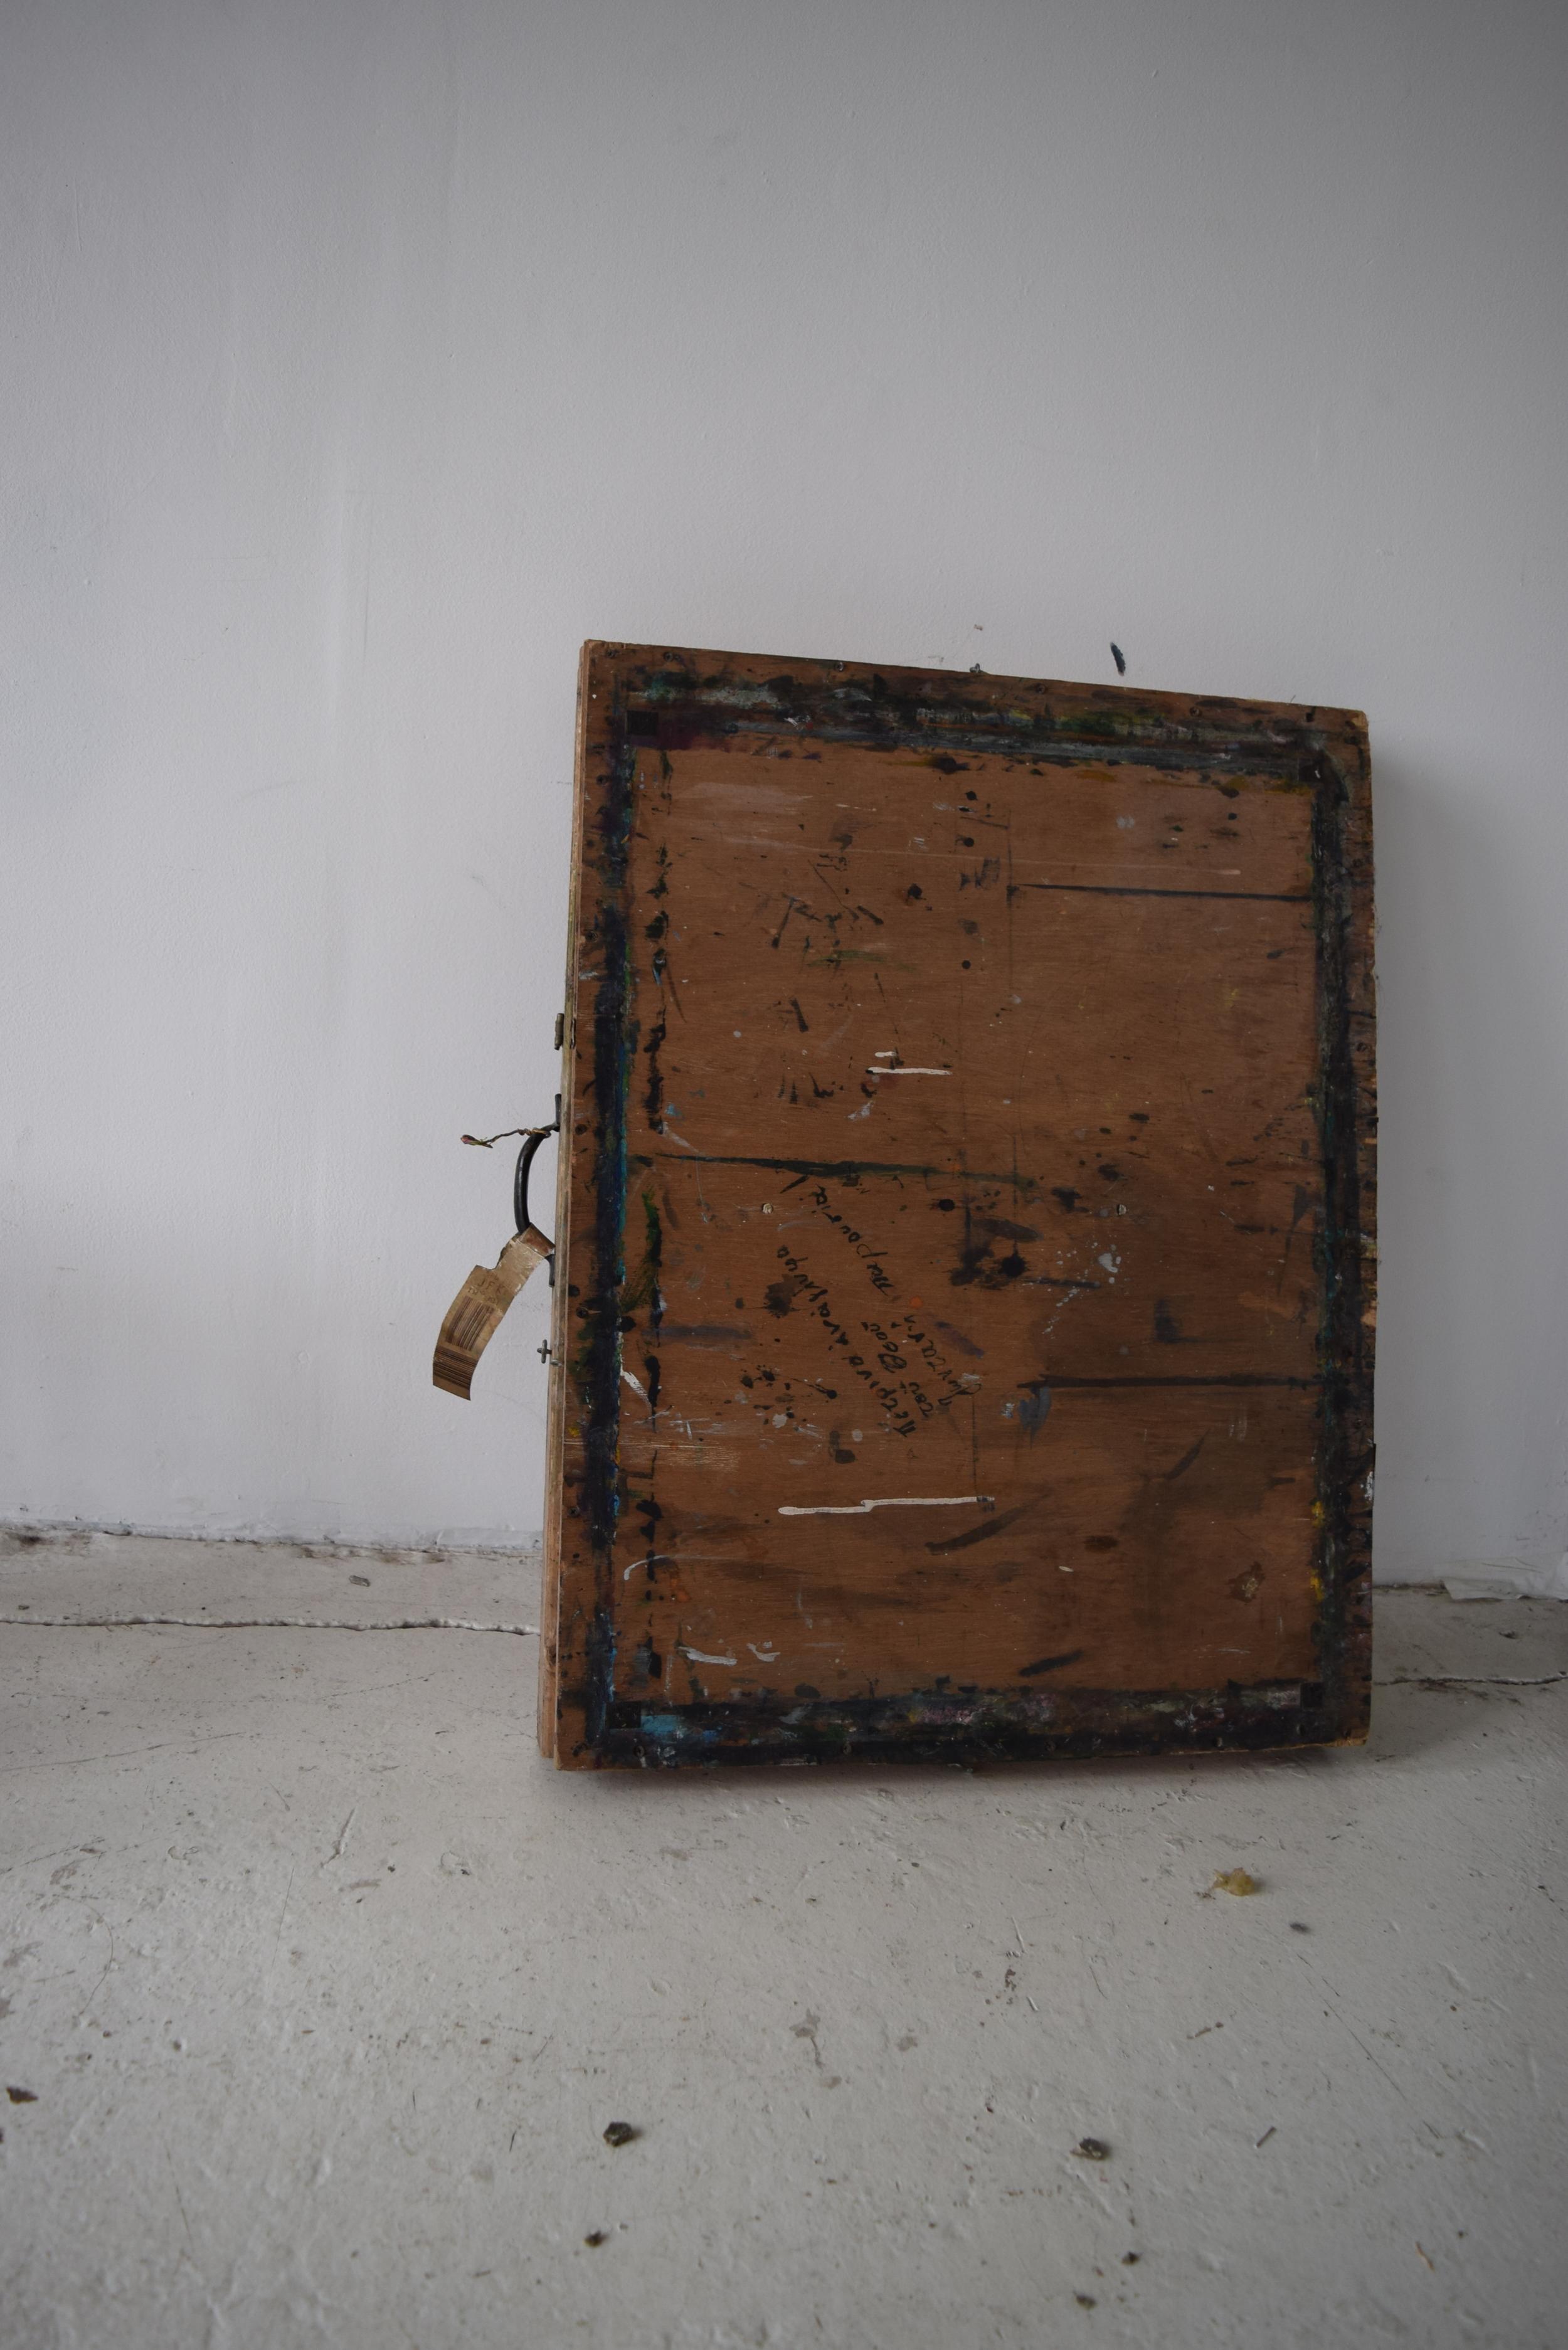 A Painter's Box